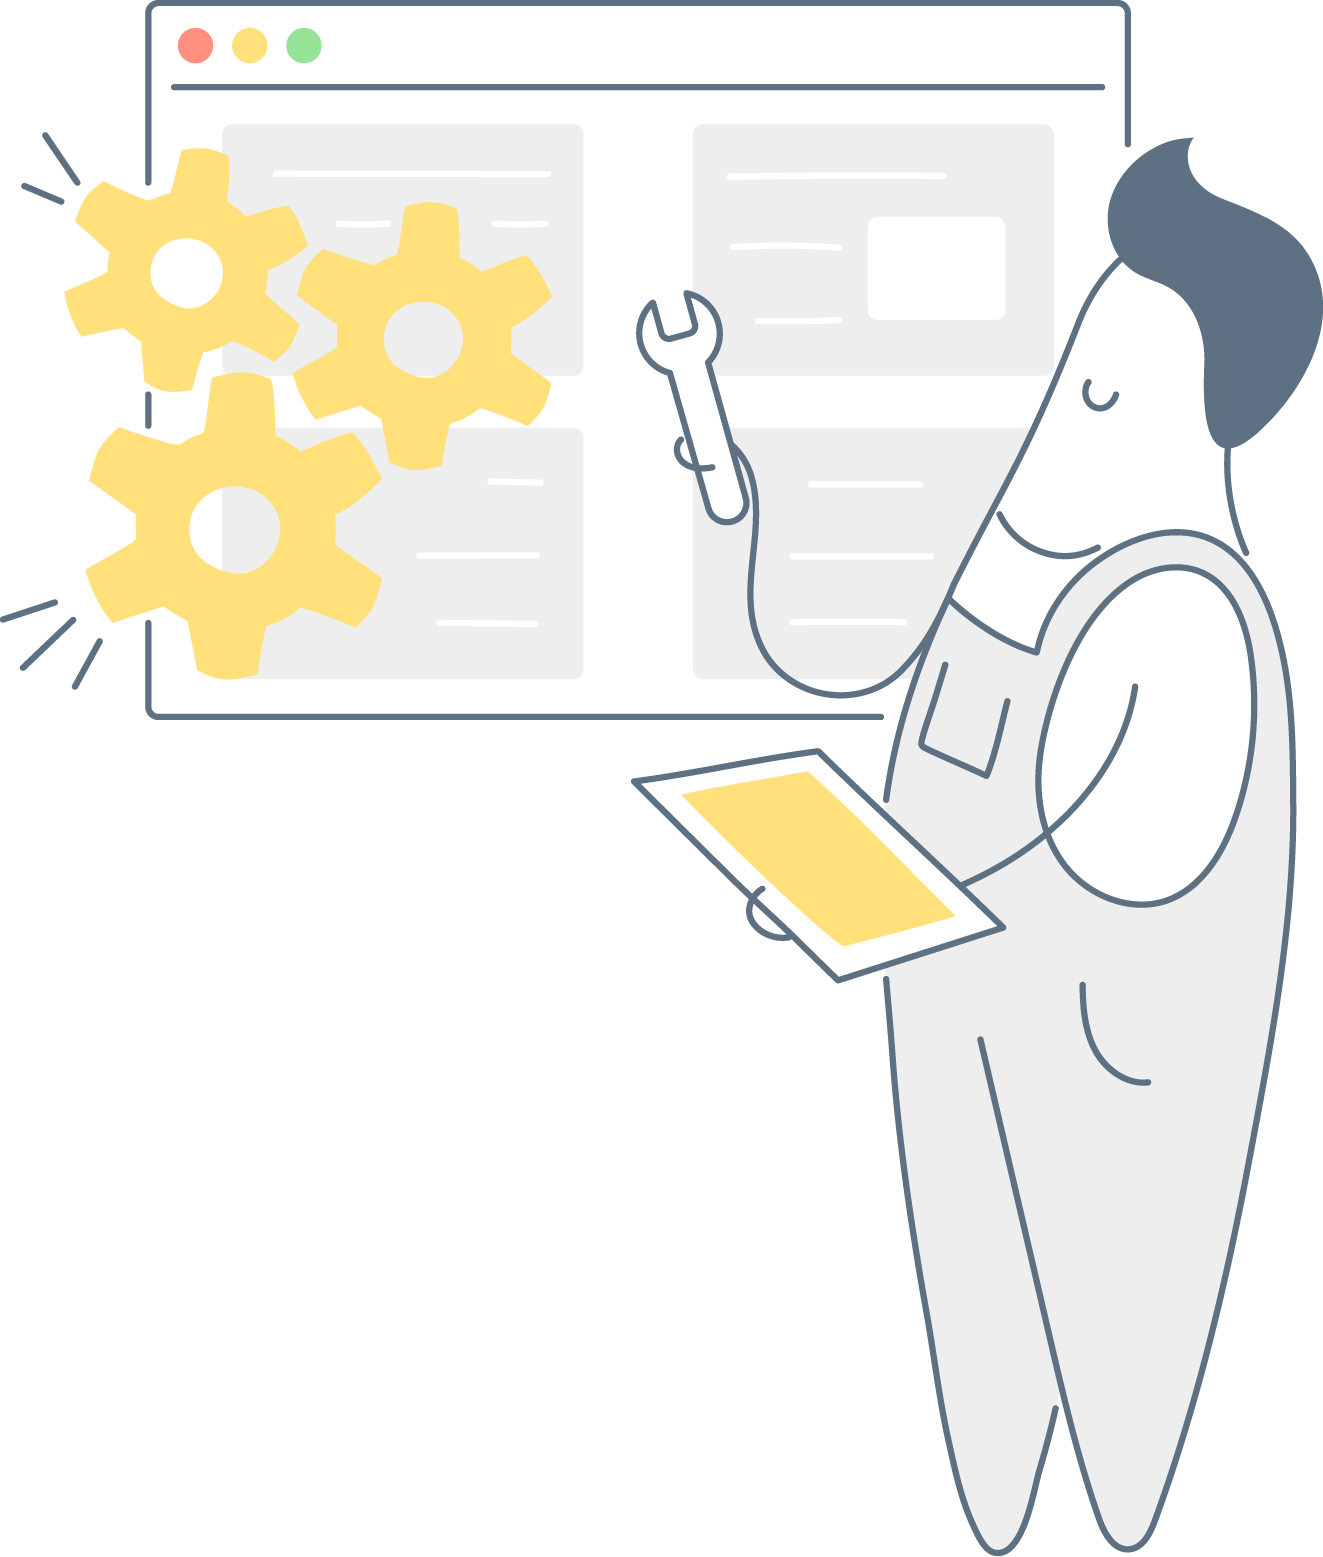 Nuxeo Consultants - Maretha, digital asset management for marketing